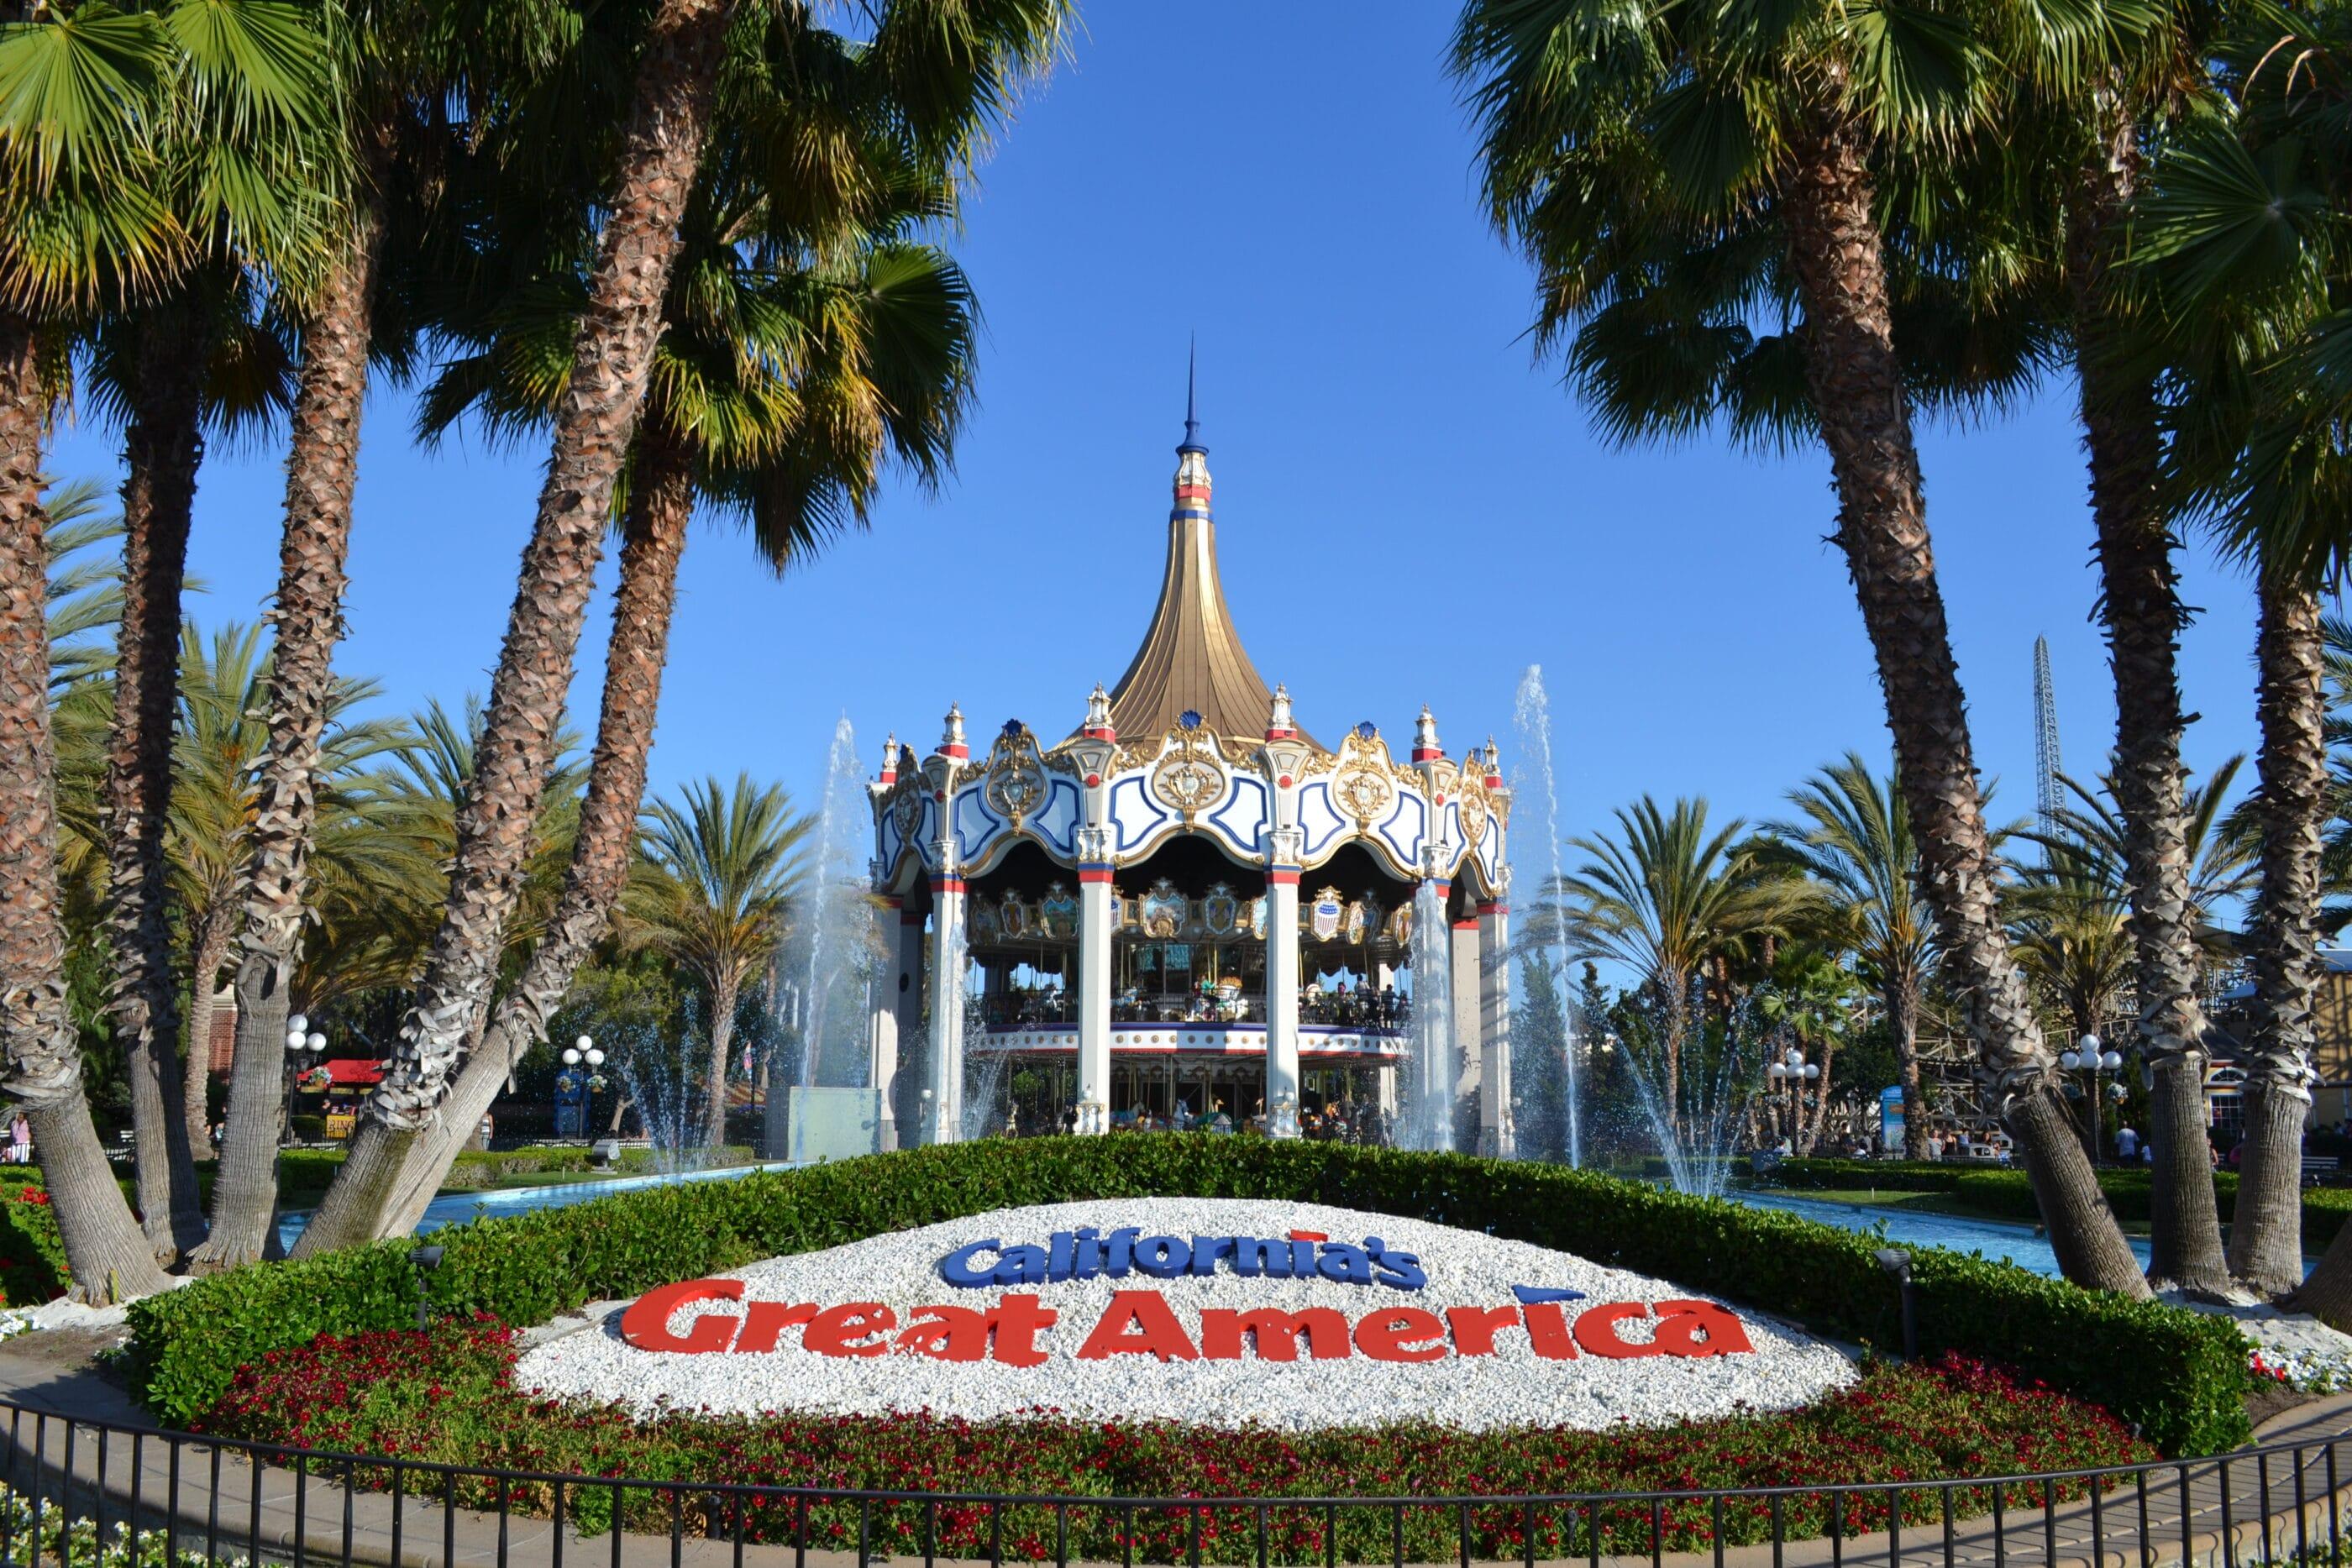 California's Great America carousel